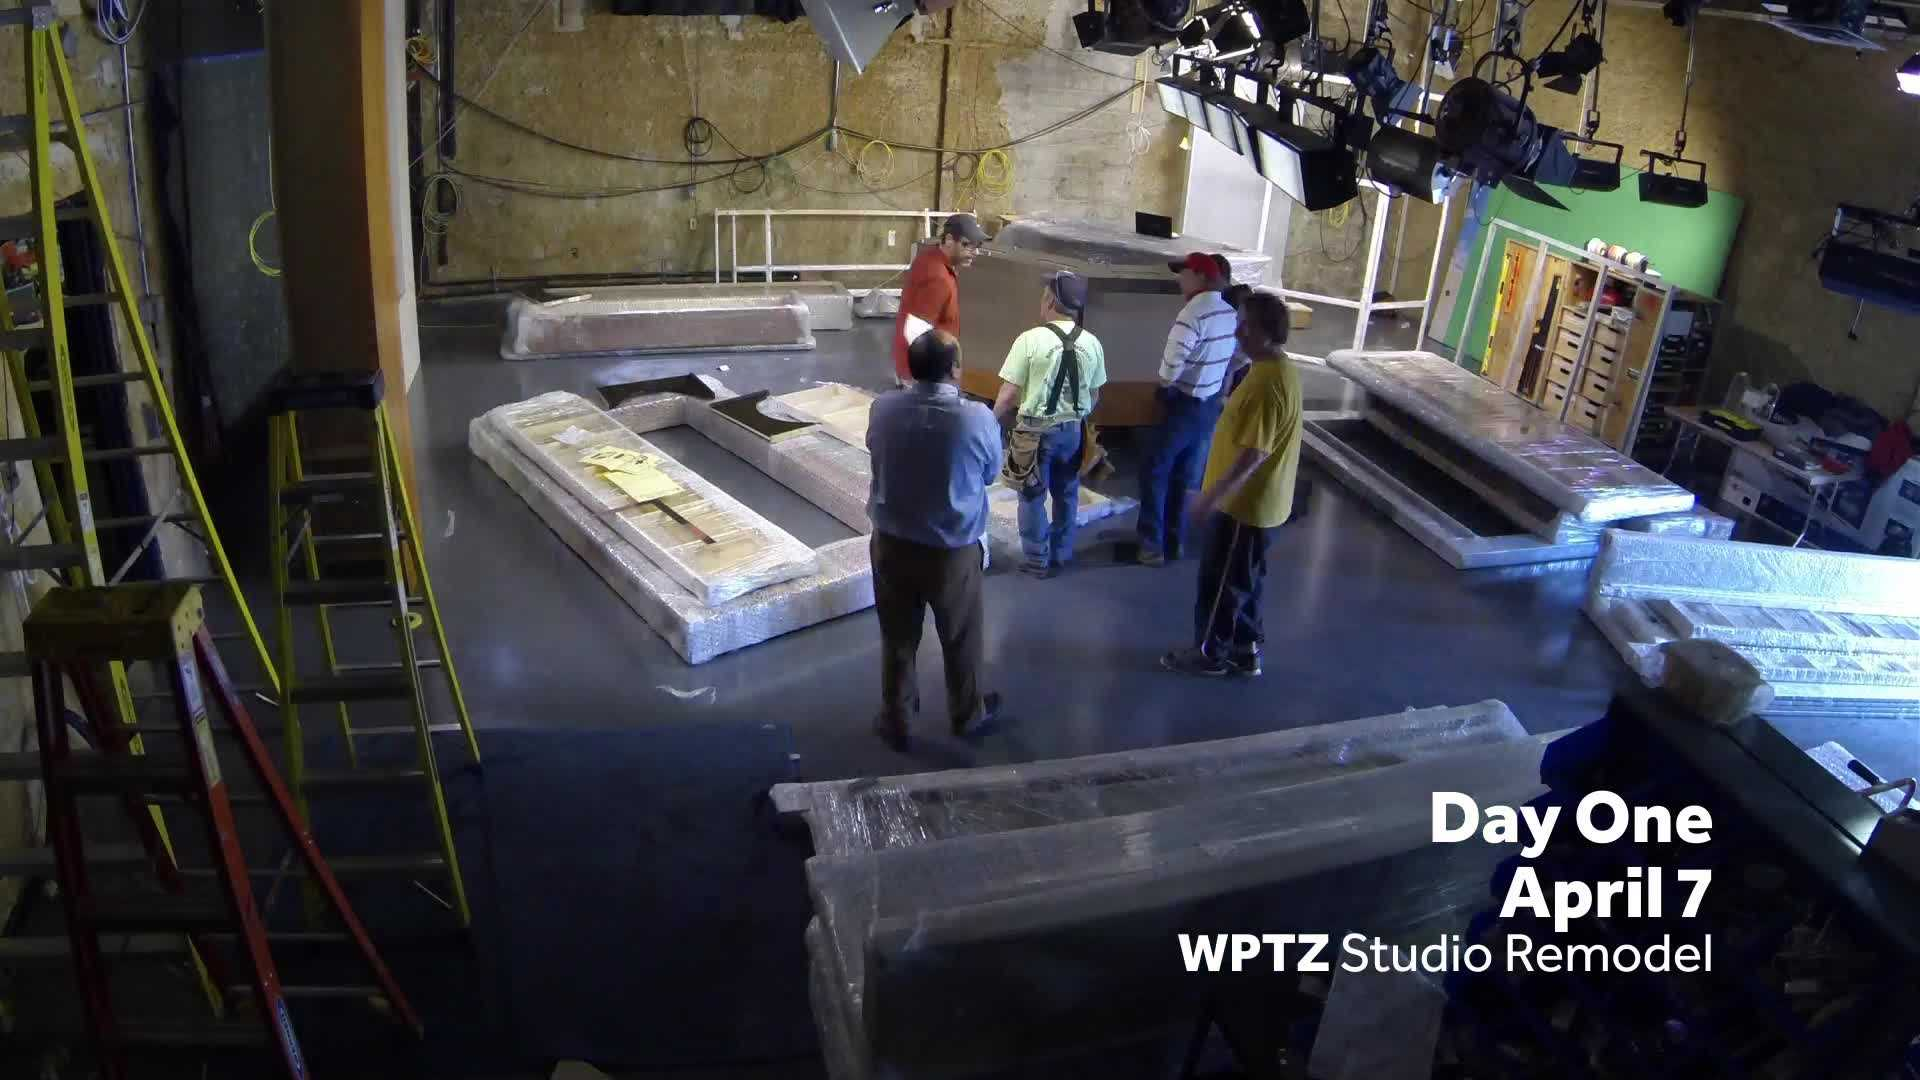 Day one of WPTZ's studio renovation.